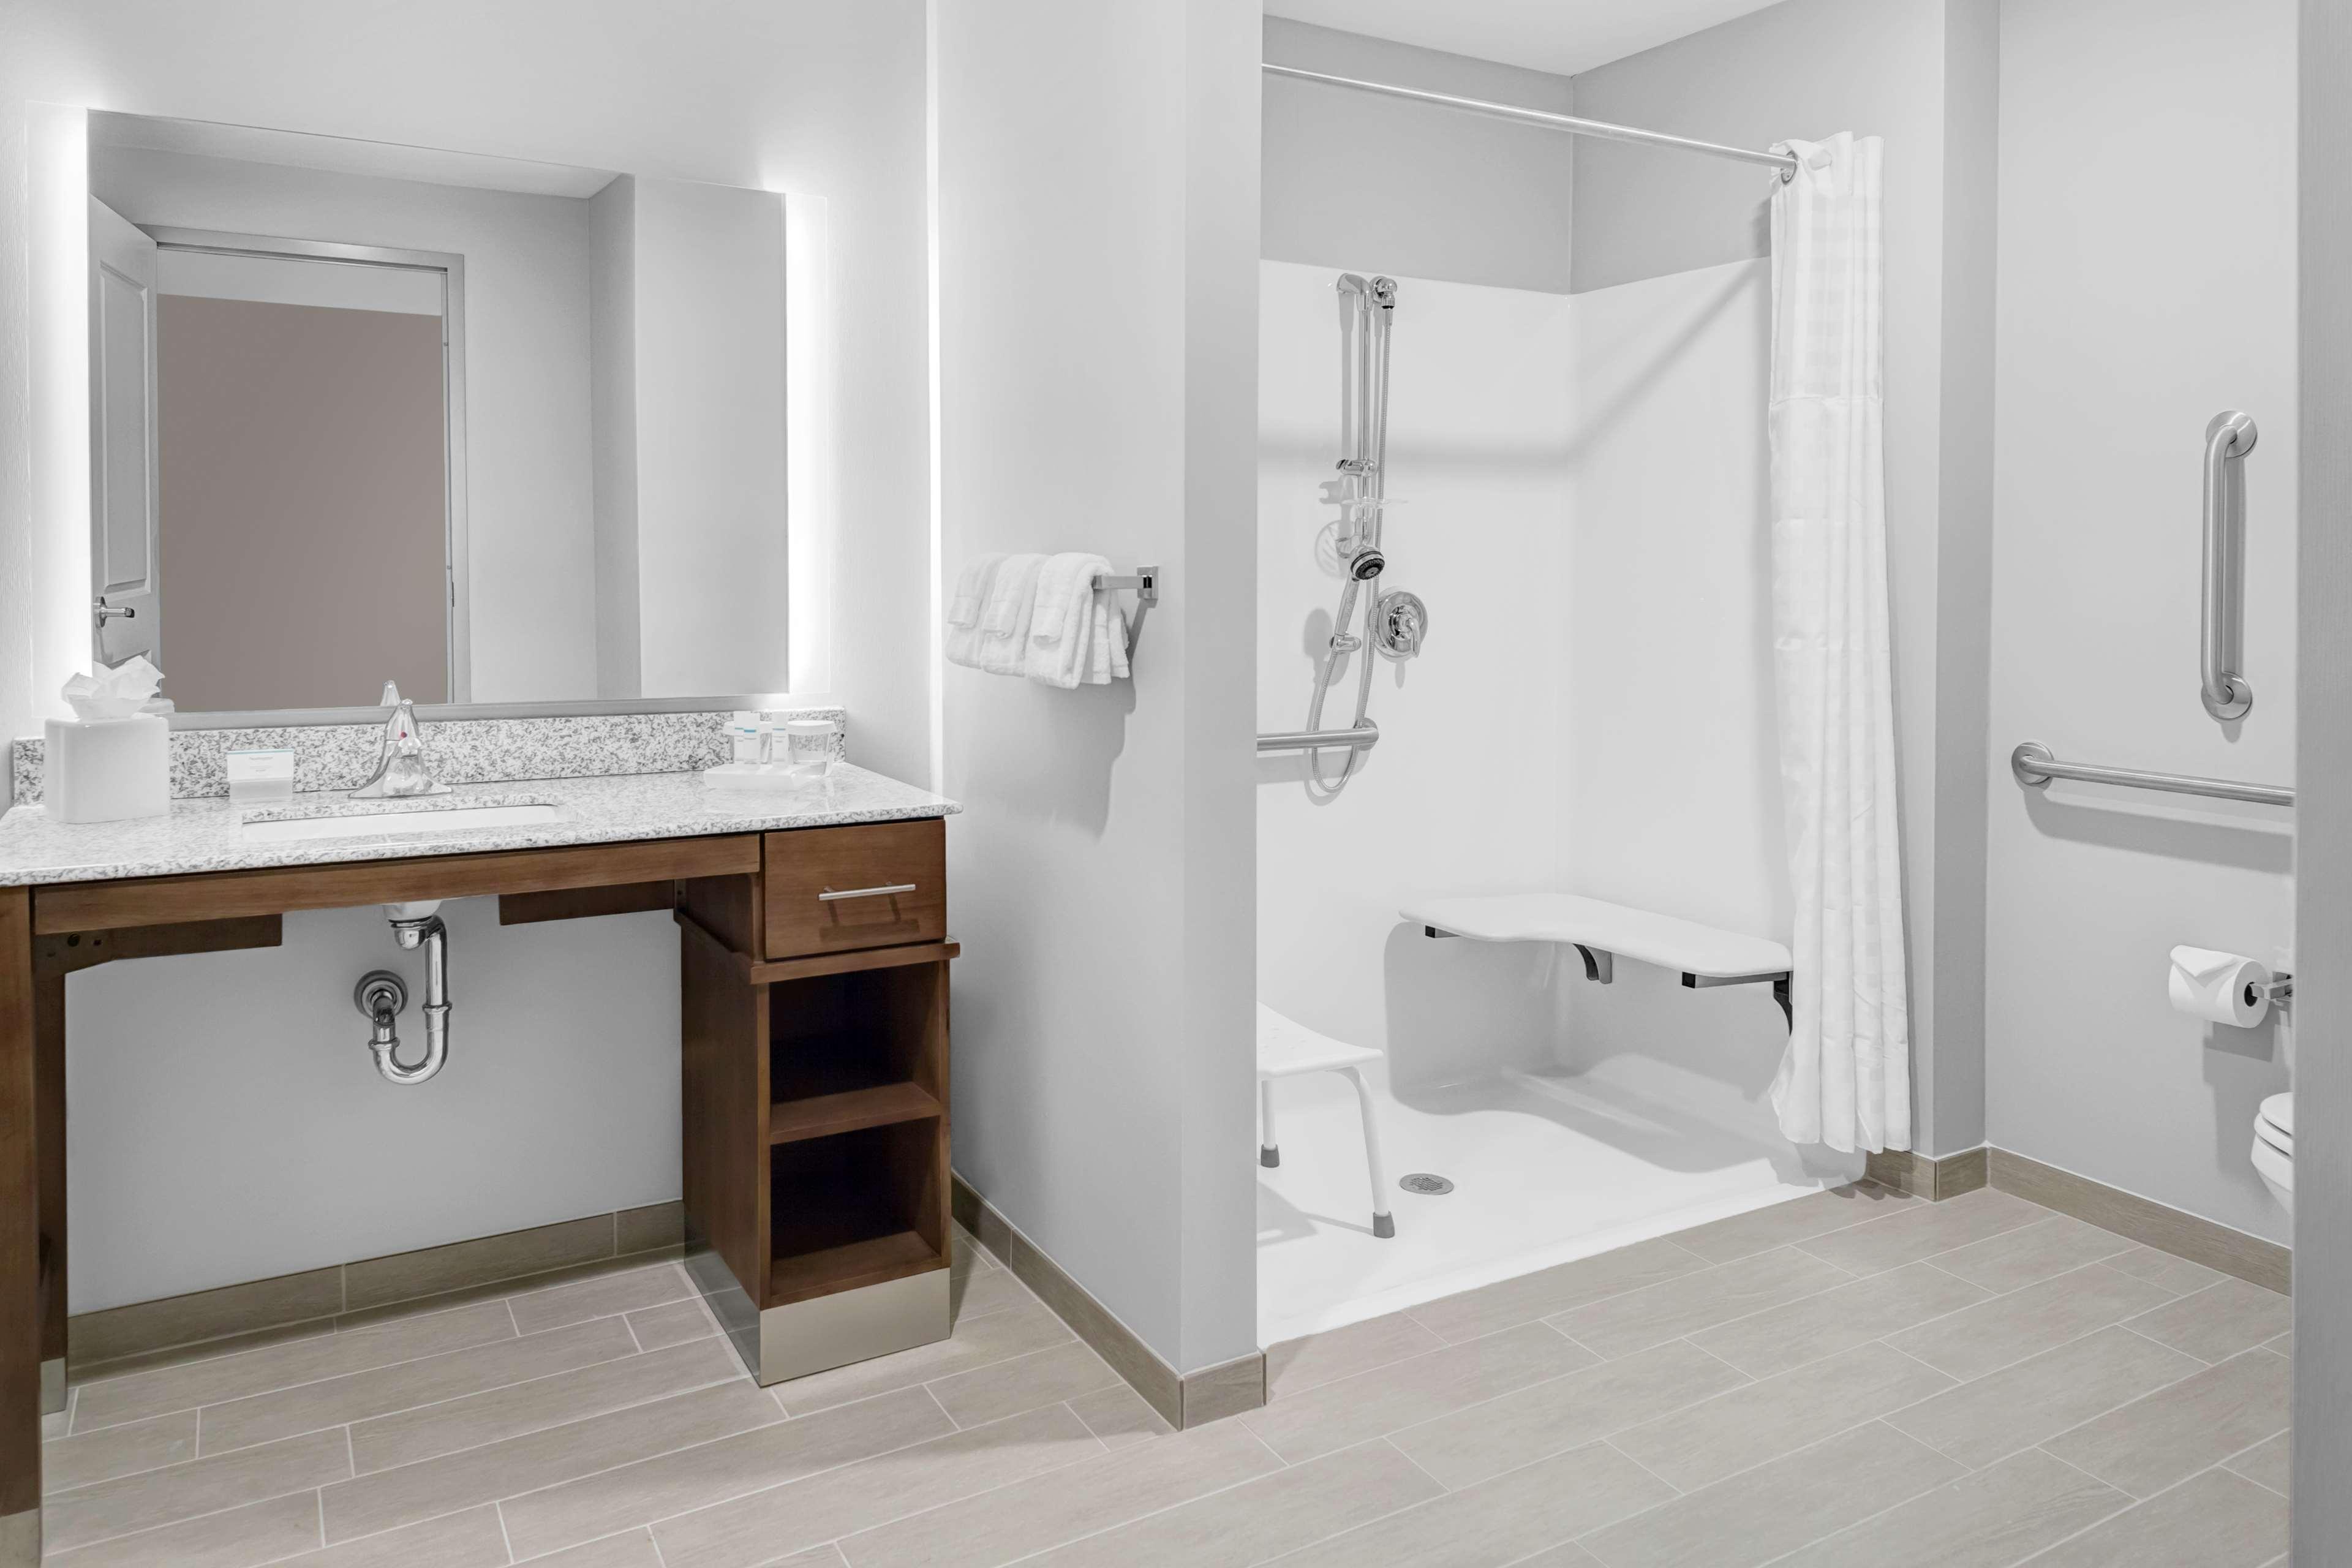 Homewood Suites by Hilton Wauwatosa Milwaukee image 15